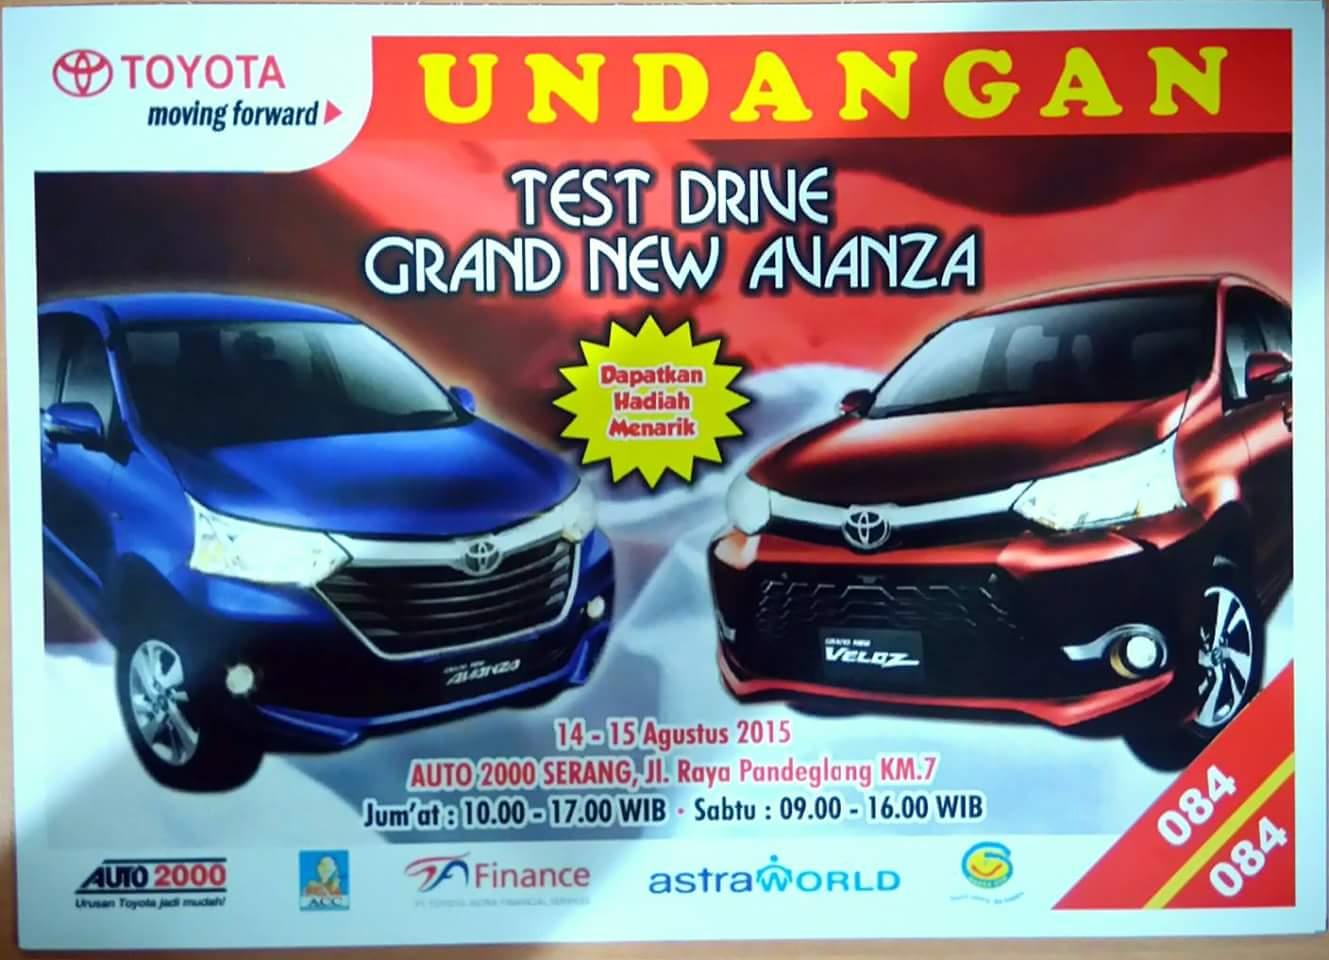 test drive grand new veloz ukuran wiper avanza testdrive berhadiah auto2000 serang